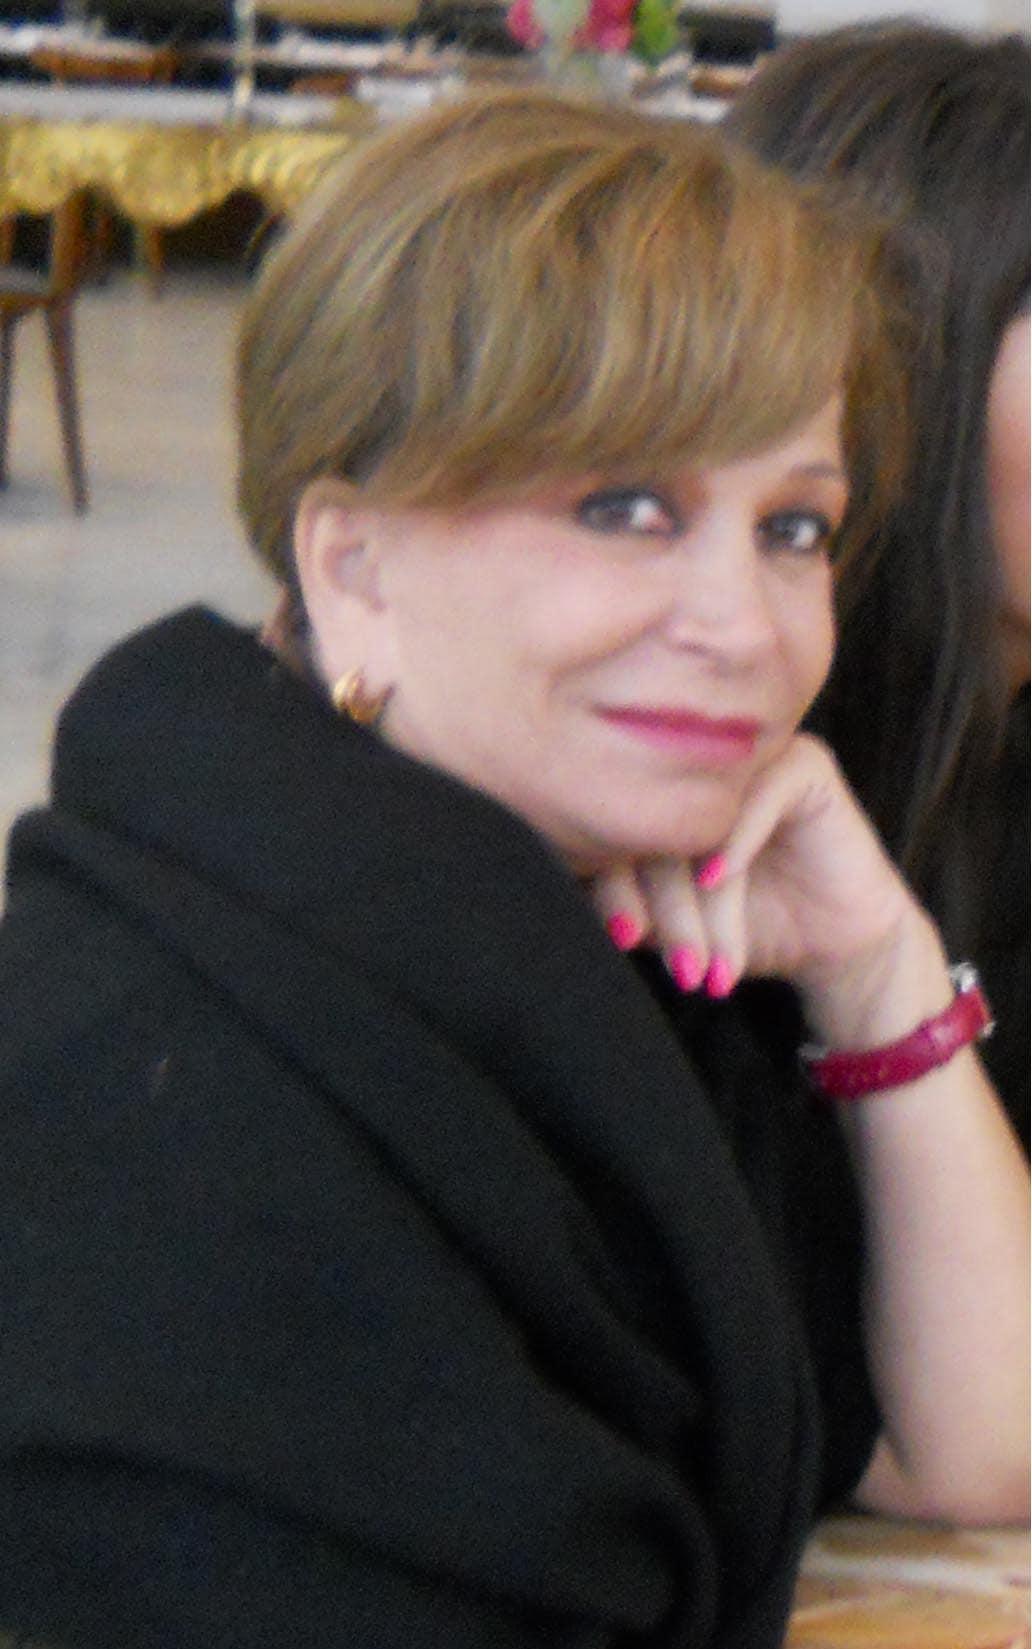 Lourdes From Rosarito, Mexico